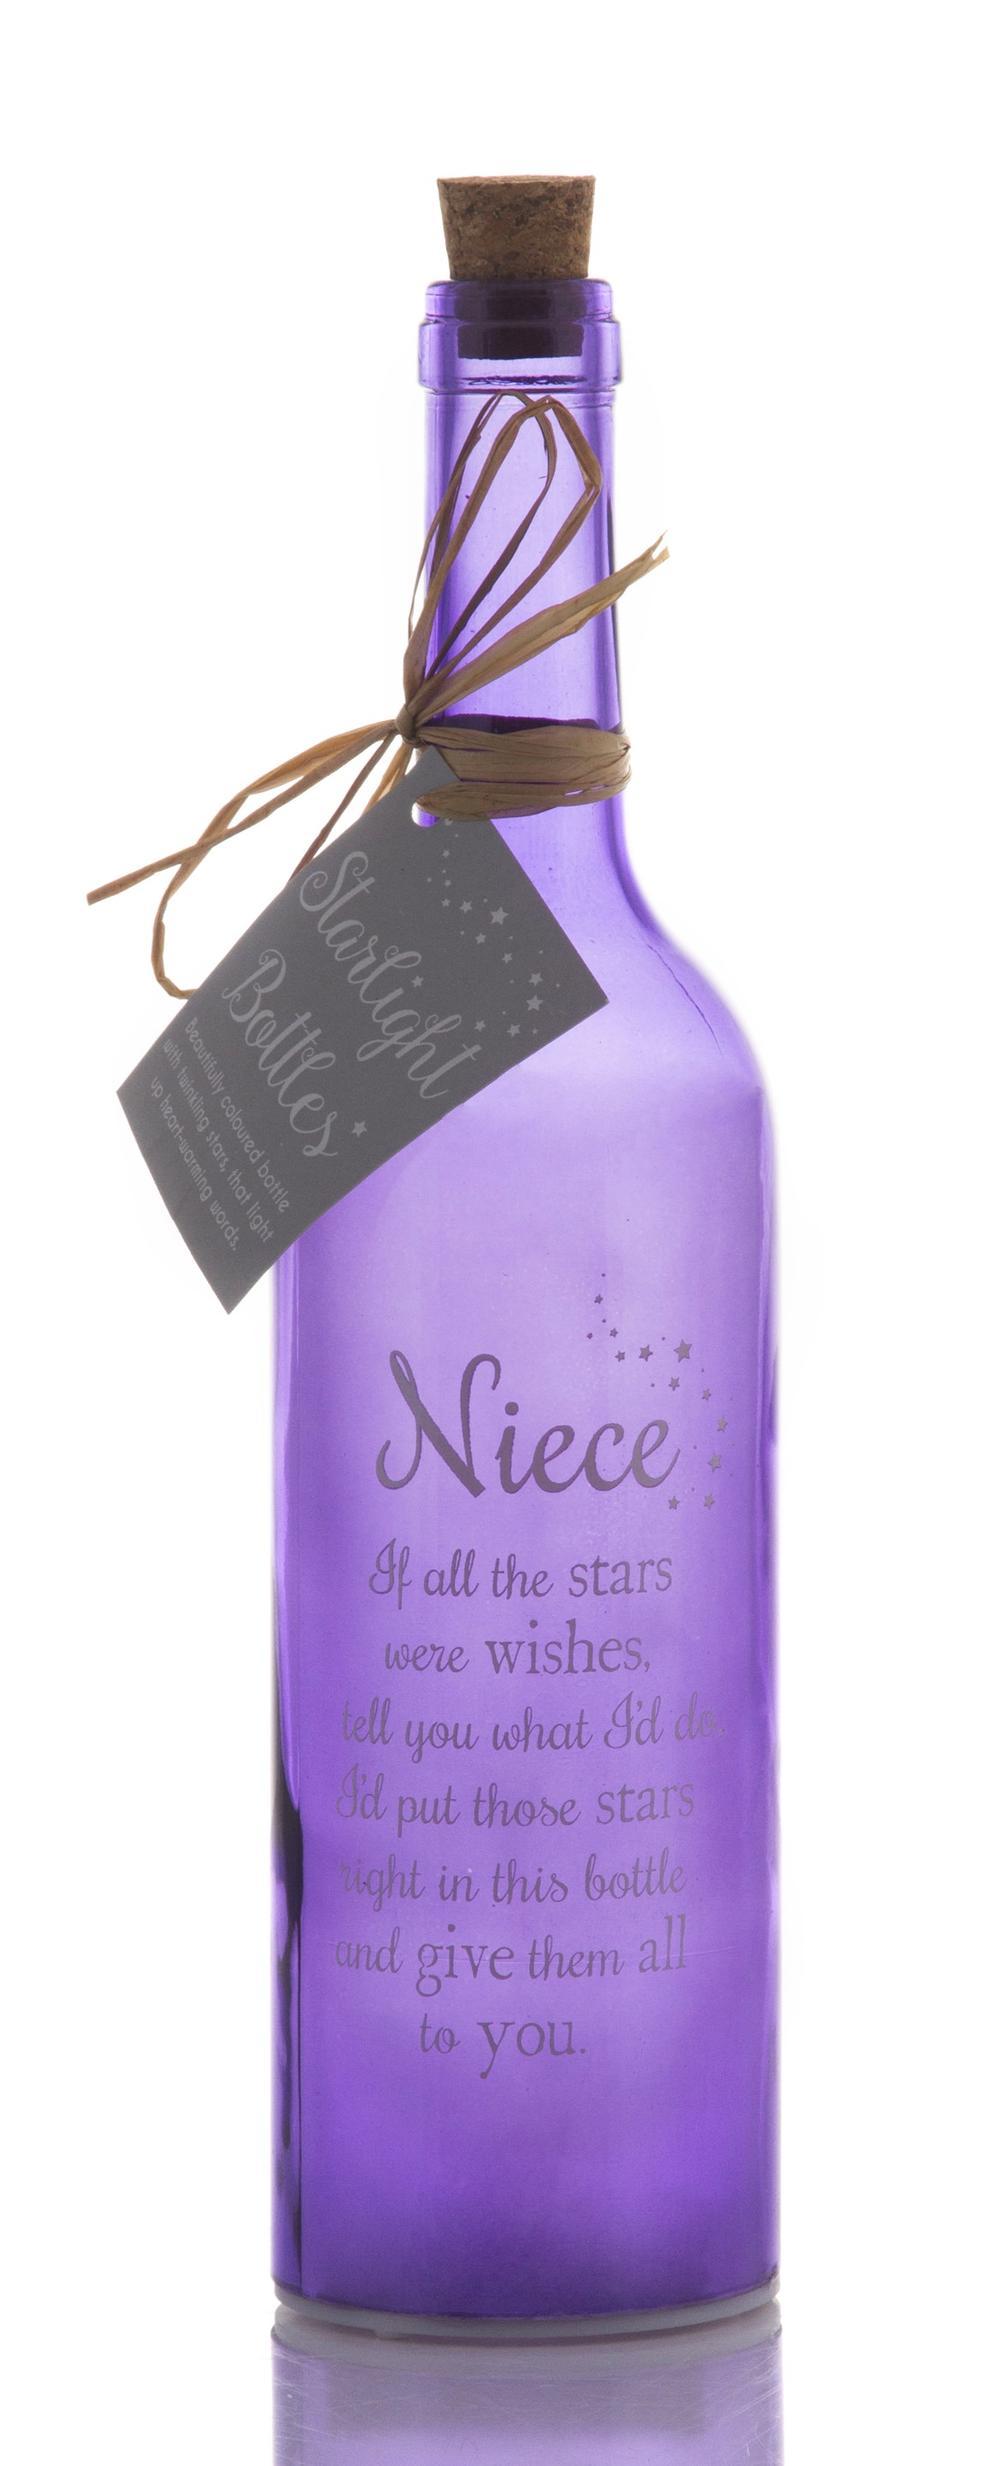 Niece Starlight Bottle Glass Light Up Sentimental Message Bottles Gift